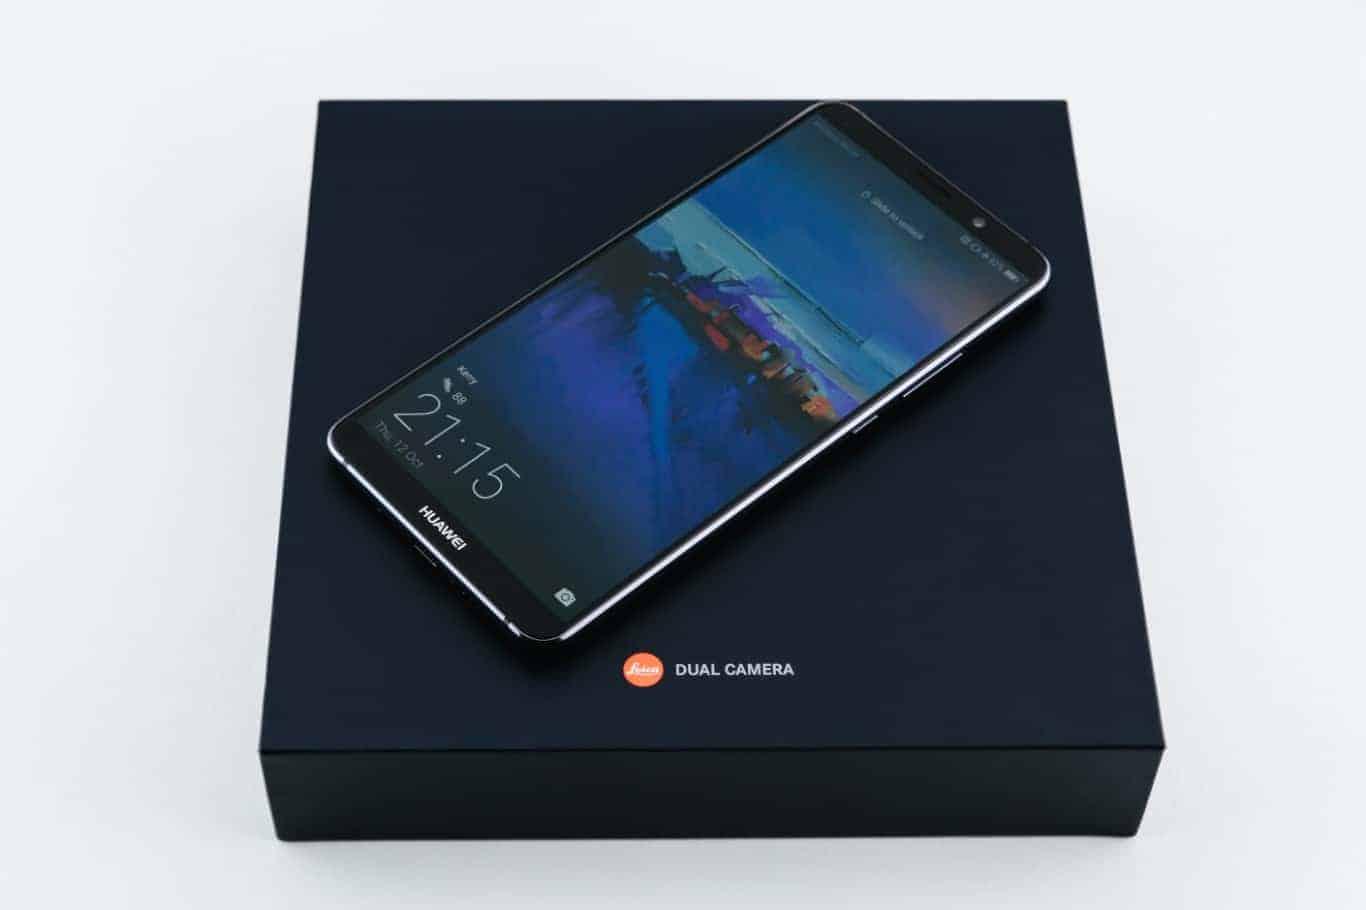 Huawei Mate 10 Pro 5